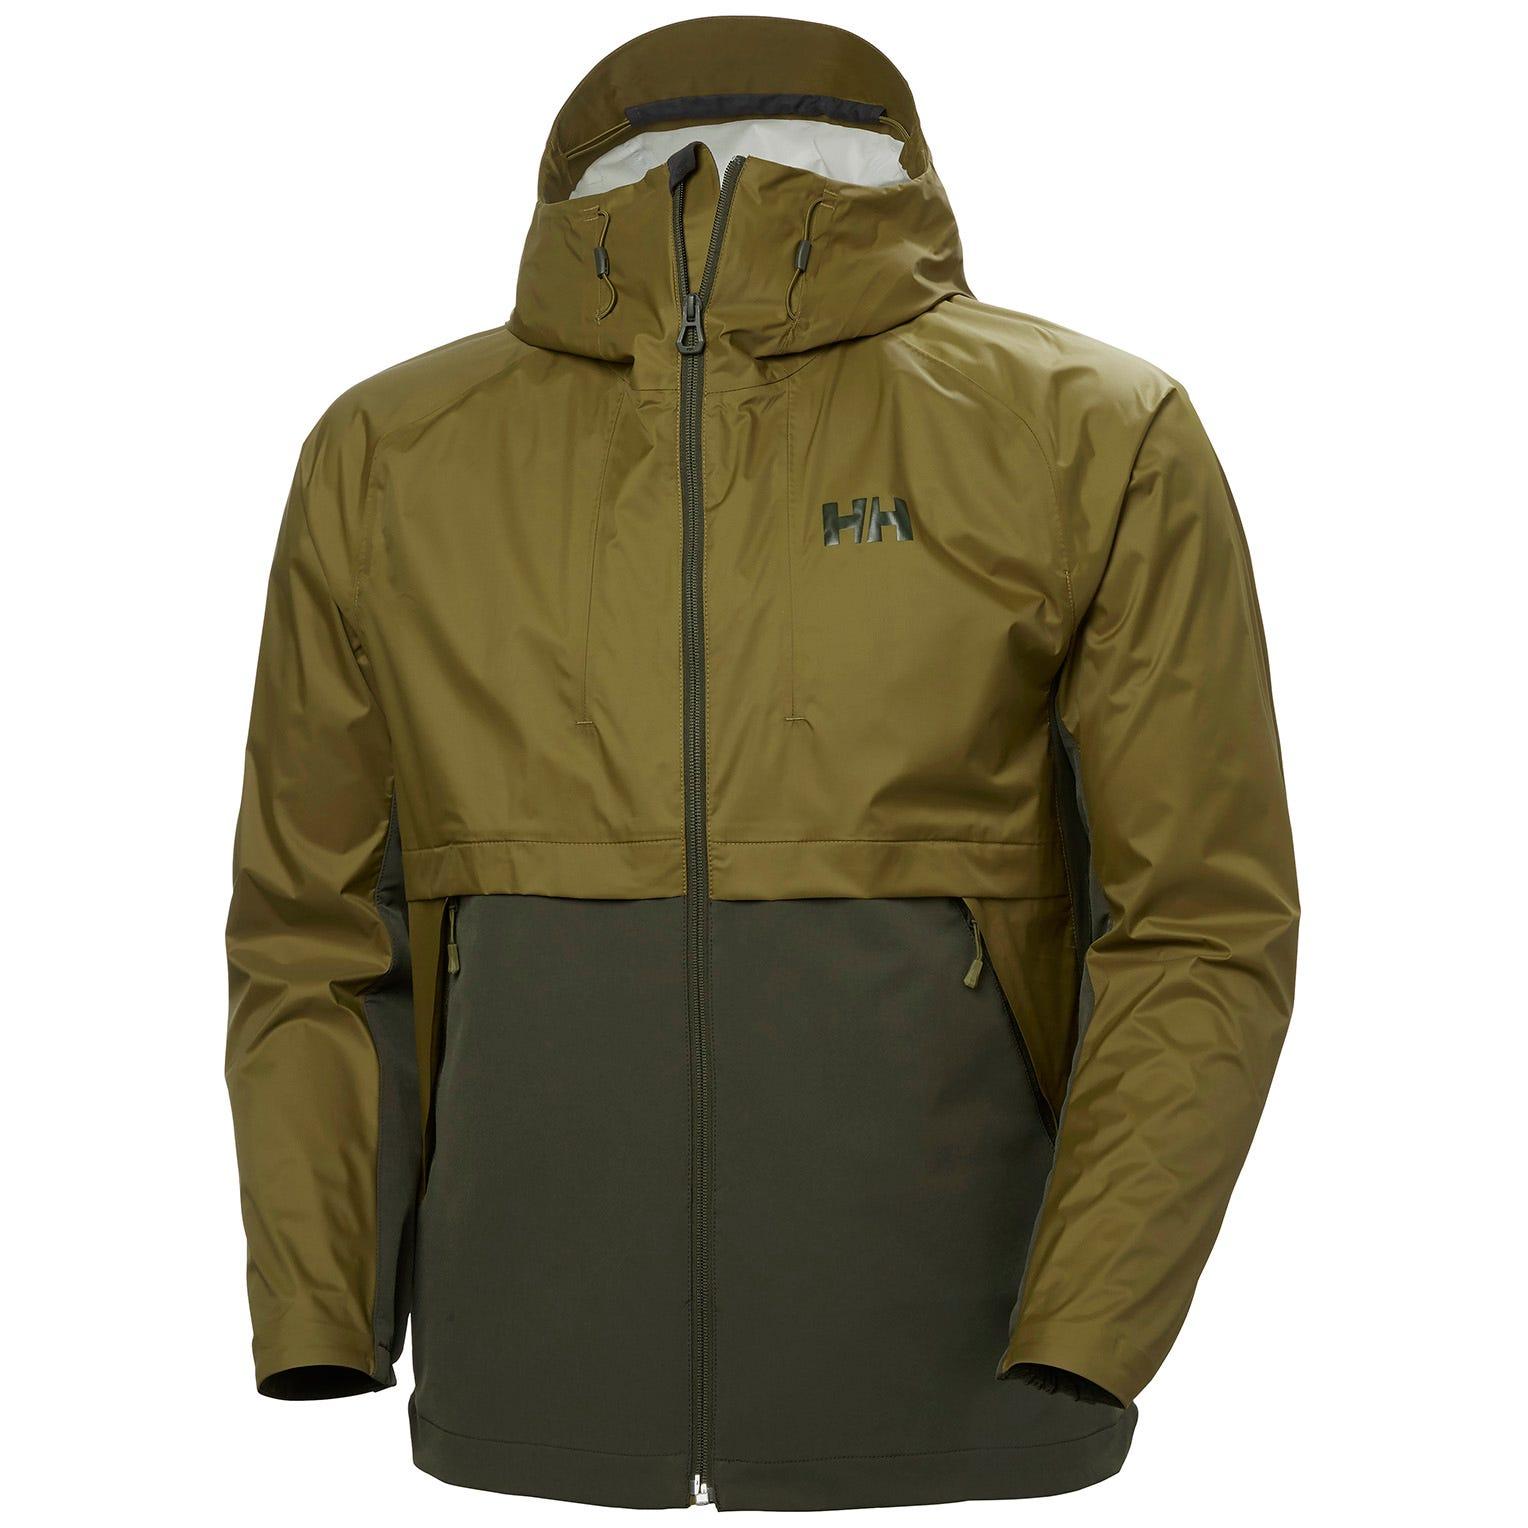 Helly Hansen Logr Jacket 2.0 Mens Hiking Green M